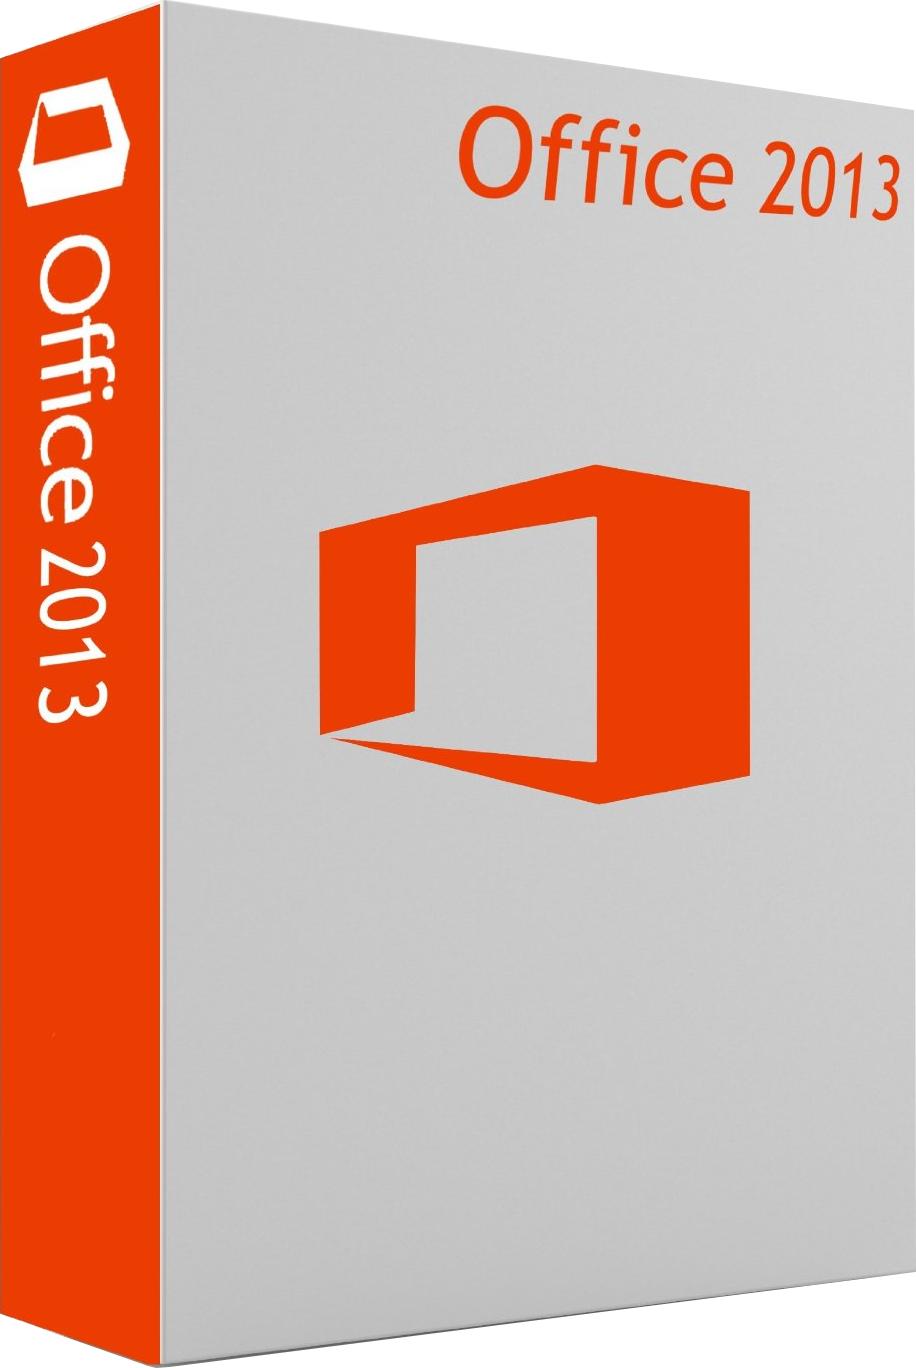 Microsoft Office 2013 Pro Plus Full Version Download (x86/x64)